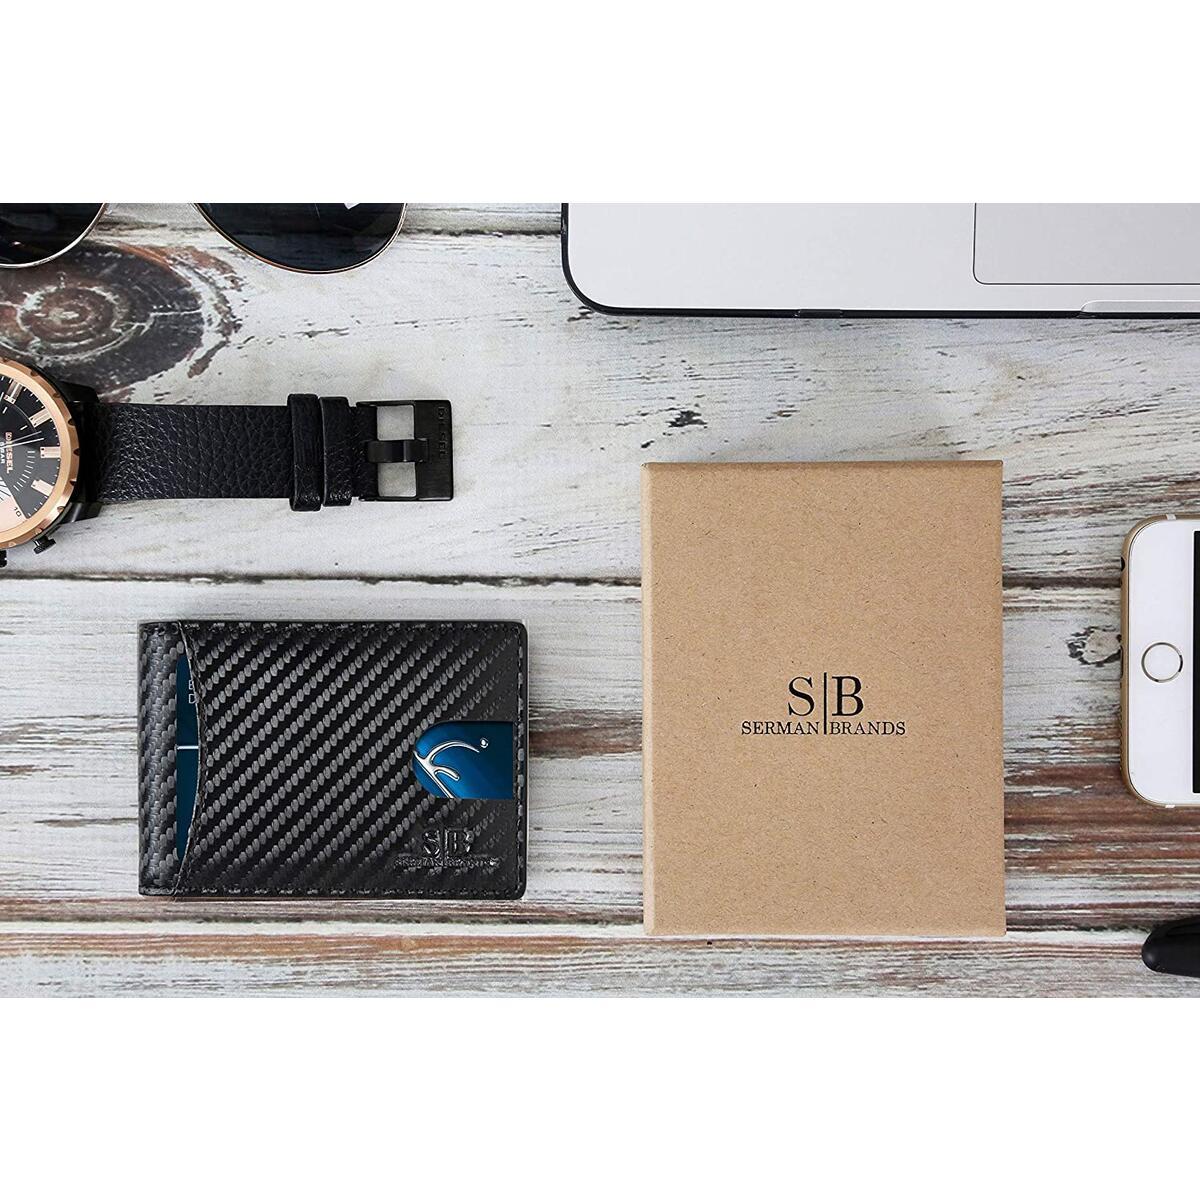 SERMAN BRANDS RFID Blocking Slim Bifold Genuine Leather Minimalist Front Pocket Wallets for Men with Money Clip - Modern Black 1.0